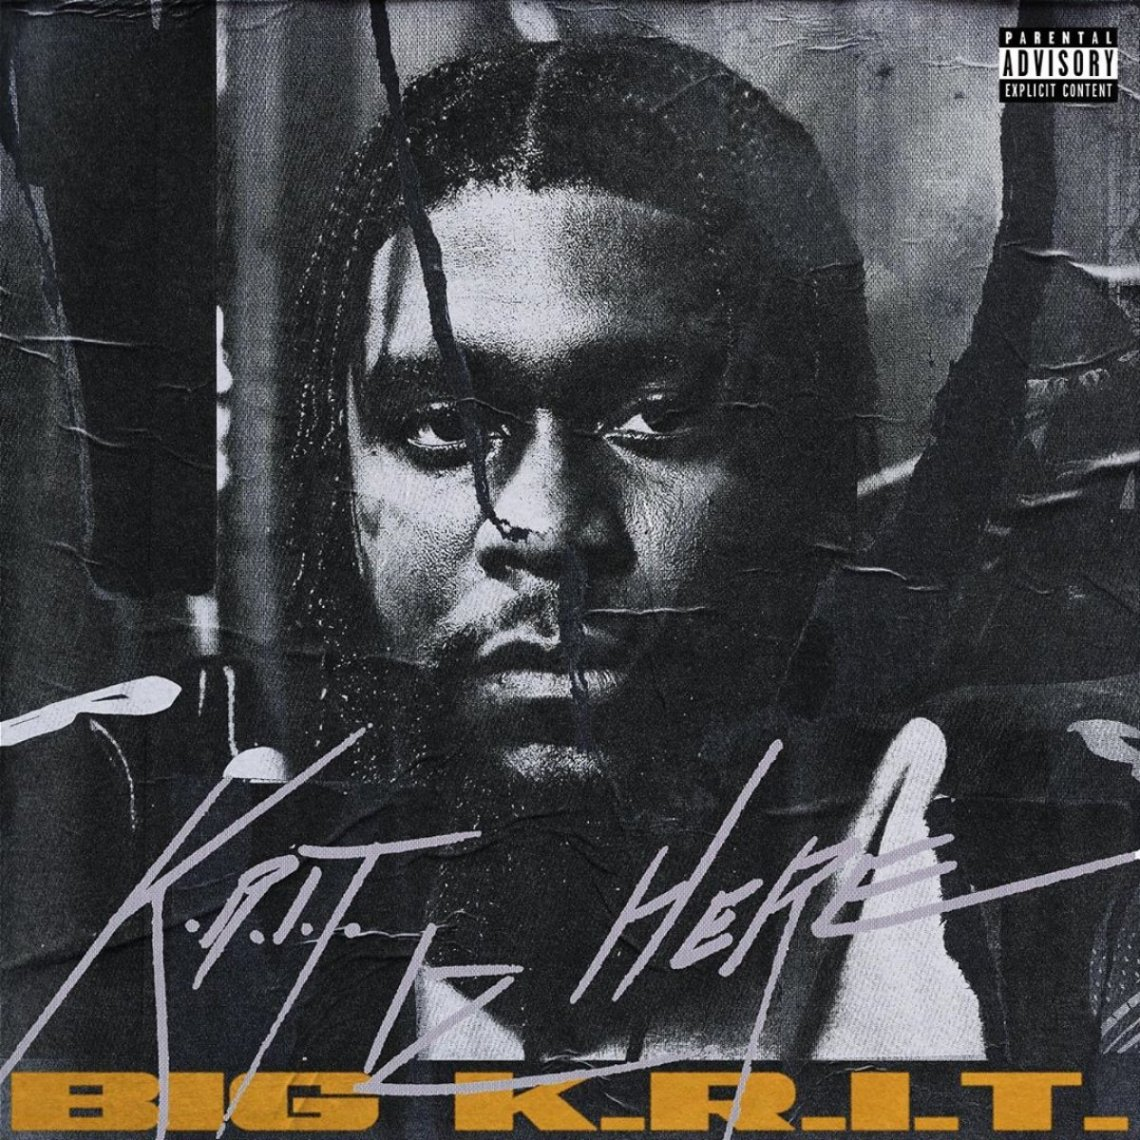 Big K.R.I.T. - K.R.I.T. IZ HERE (Album Lyrics)